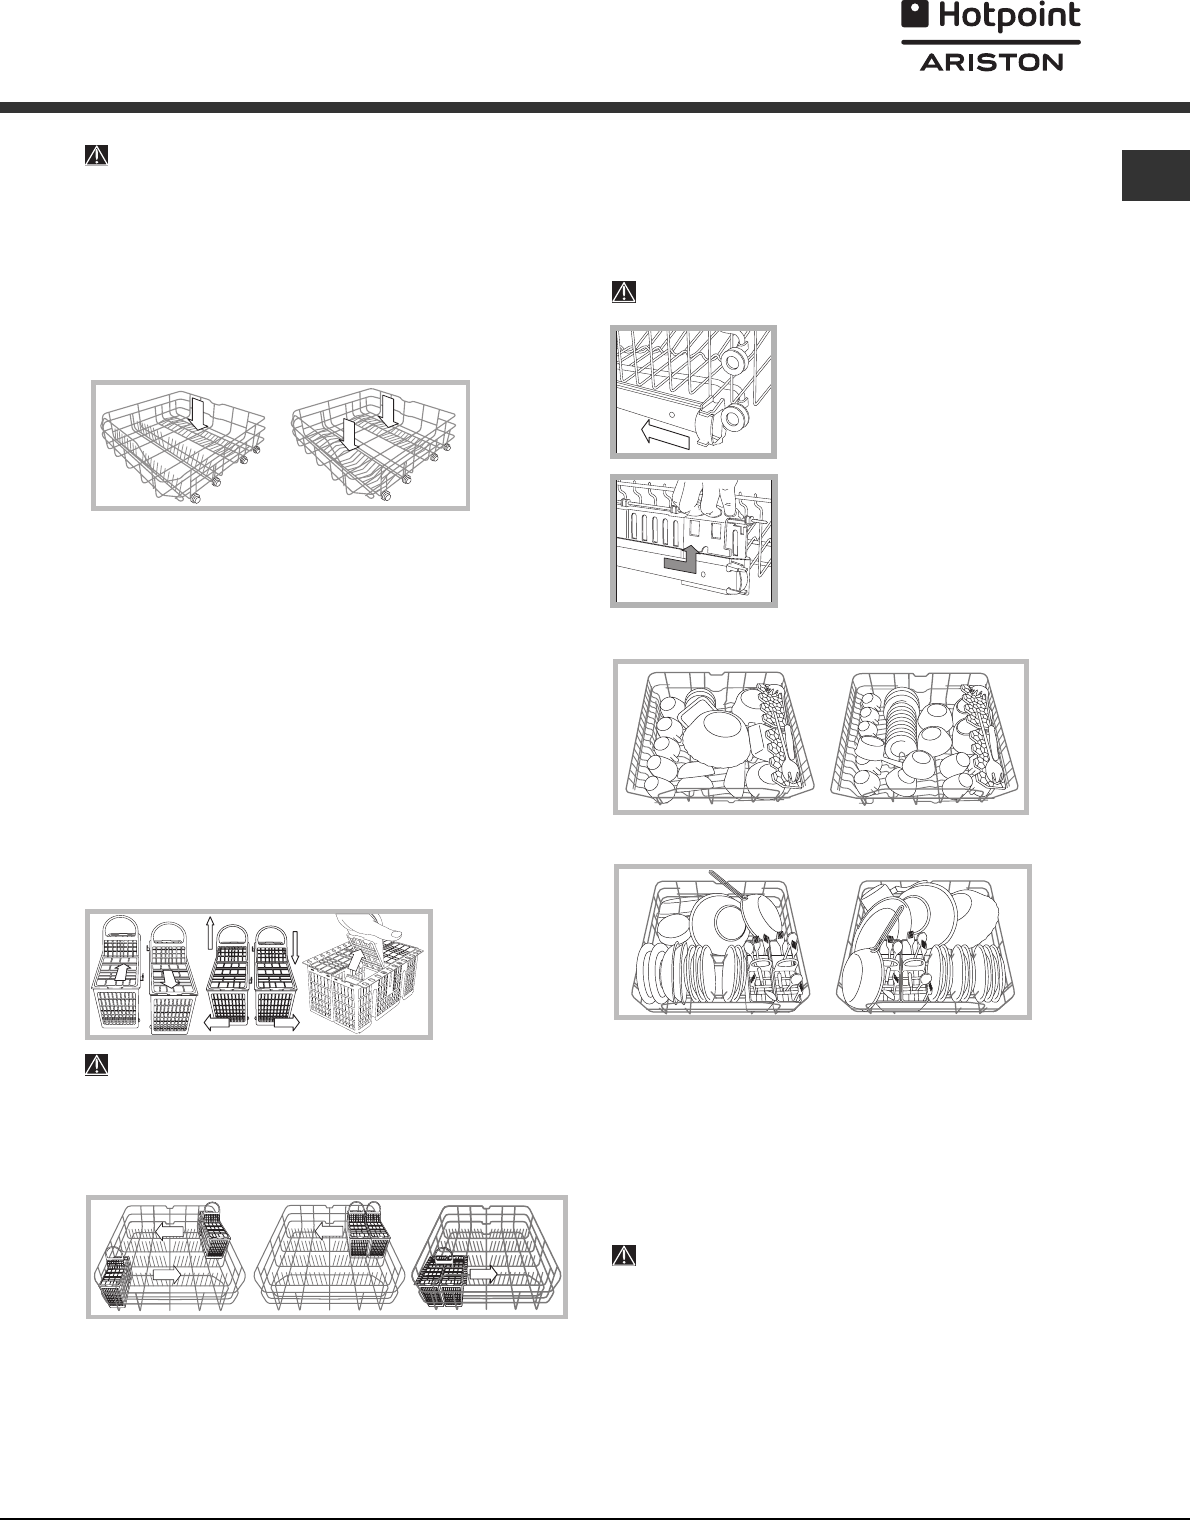 Handleiding Hotpoint-Ariston lft 114 ha (pagina 5 van 84) (Deutsch ...